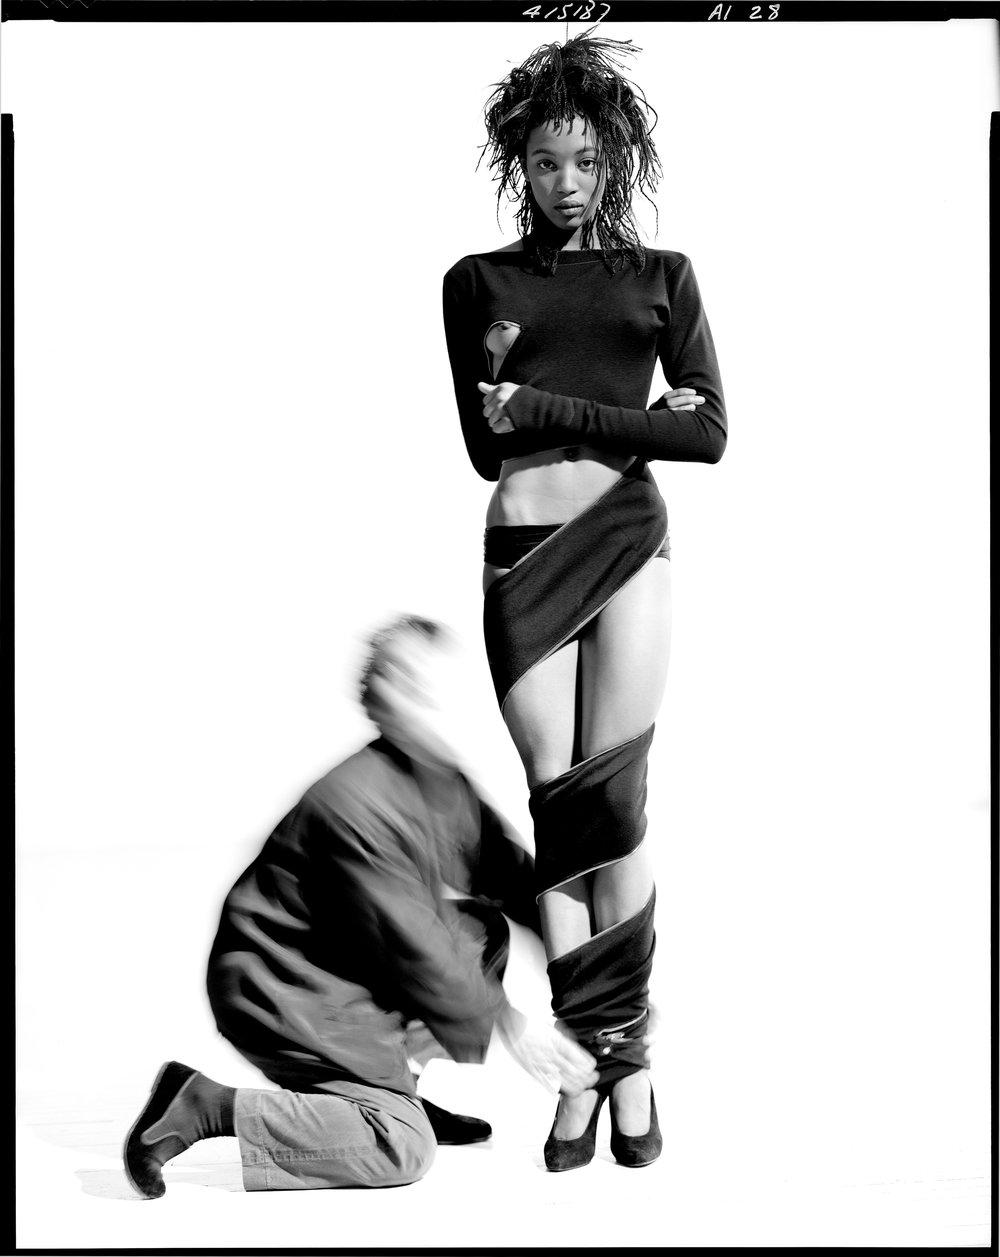 Azzedine Alaïa and Naomi Campbell, 1987 © Arthur Elgort